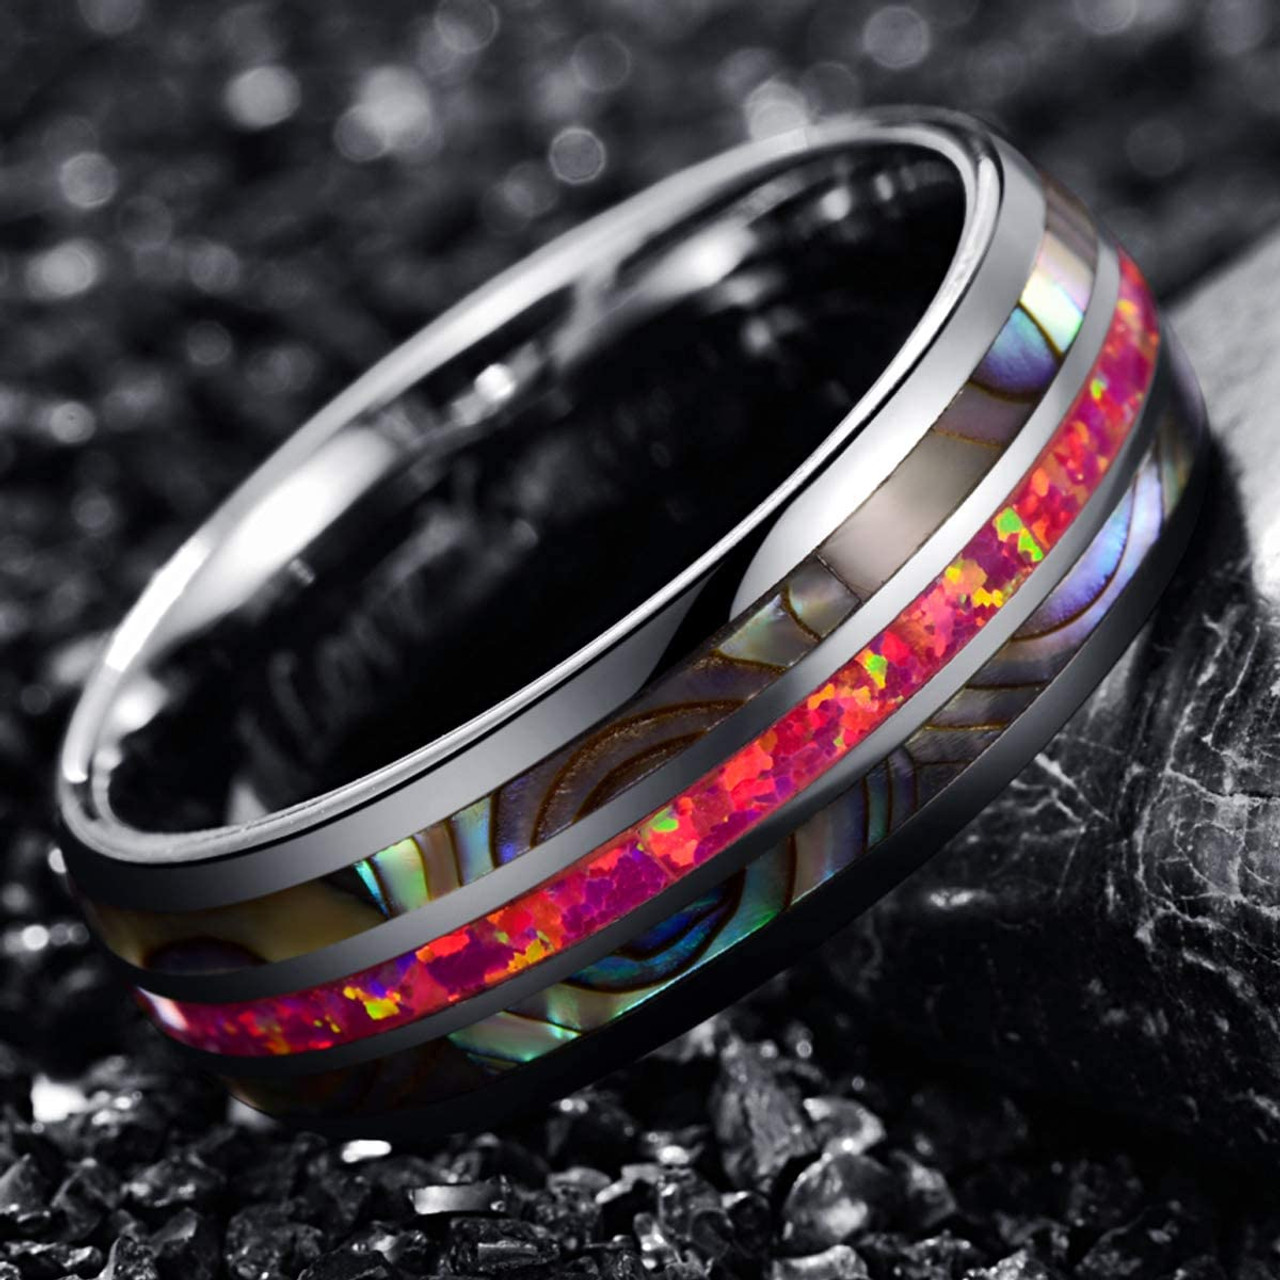 Ola Wedding Ring,Tungsten Wedding Ring,Red Opal Ring,Tungsten Carbide Ring,8mm Tungsten Ring,Engagement Ring,8mm Tungsten Wedding Ring